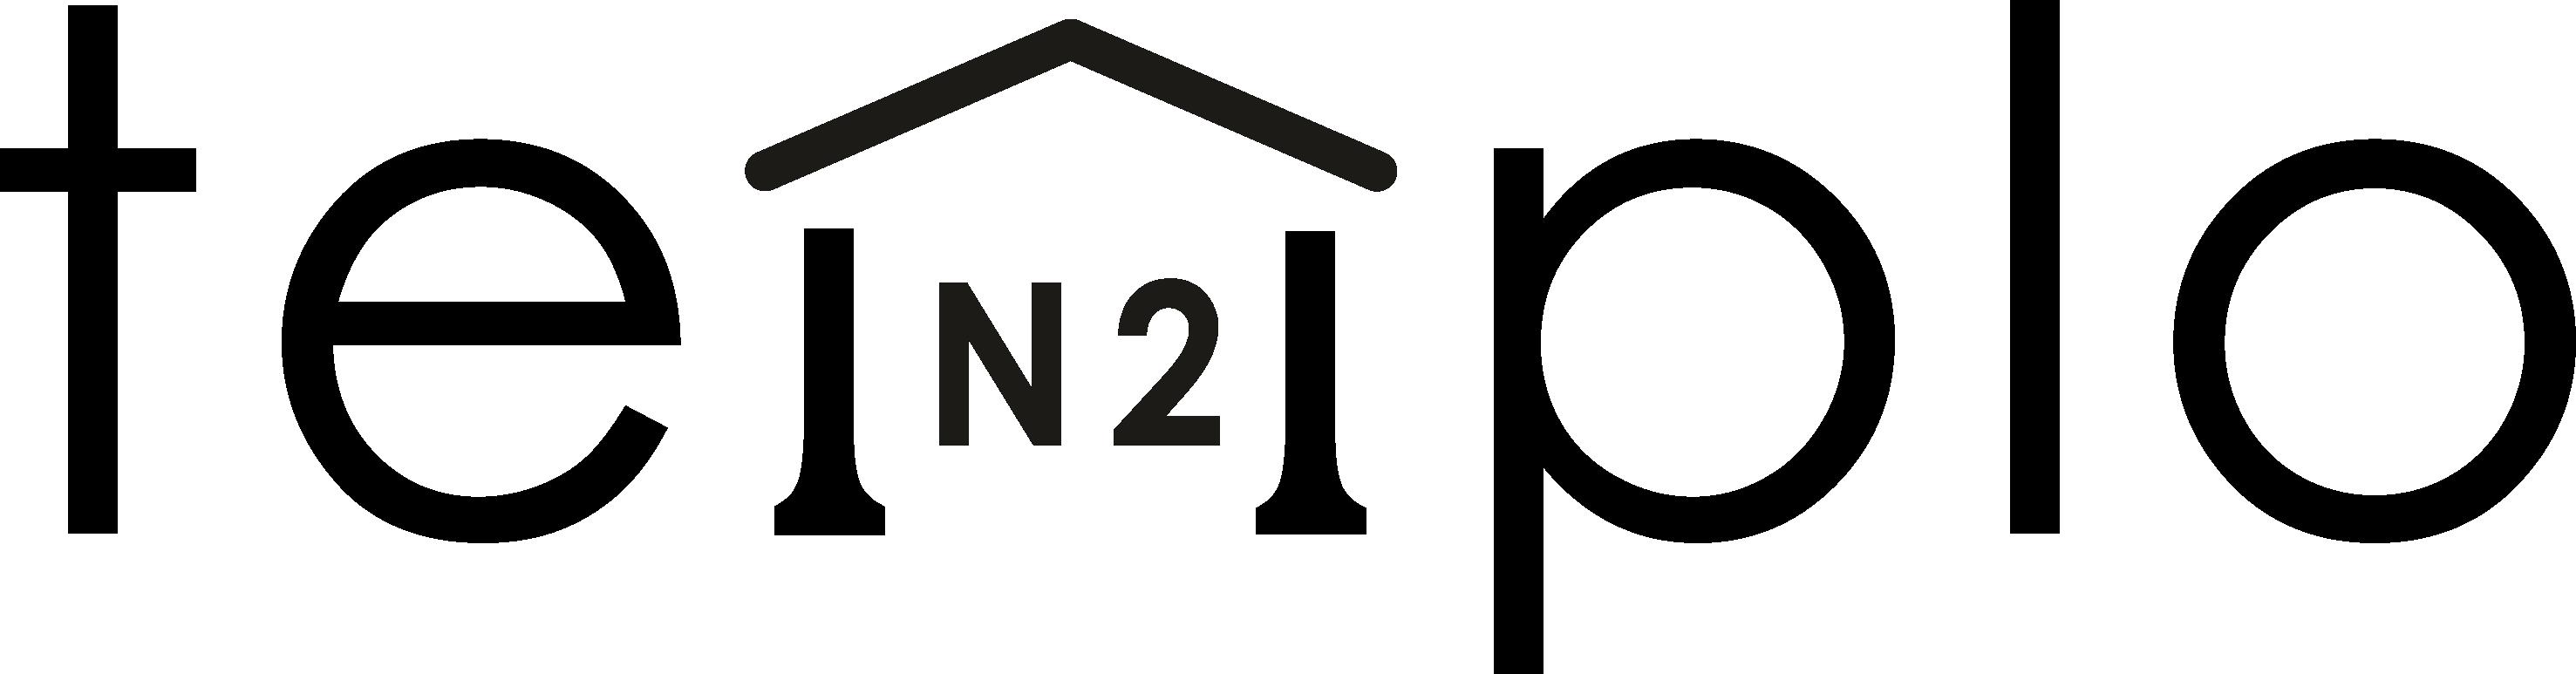 Templo N2